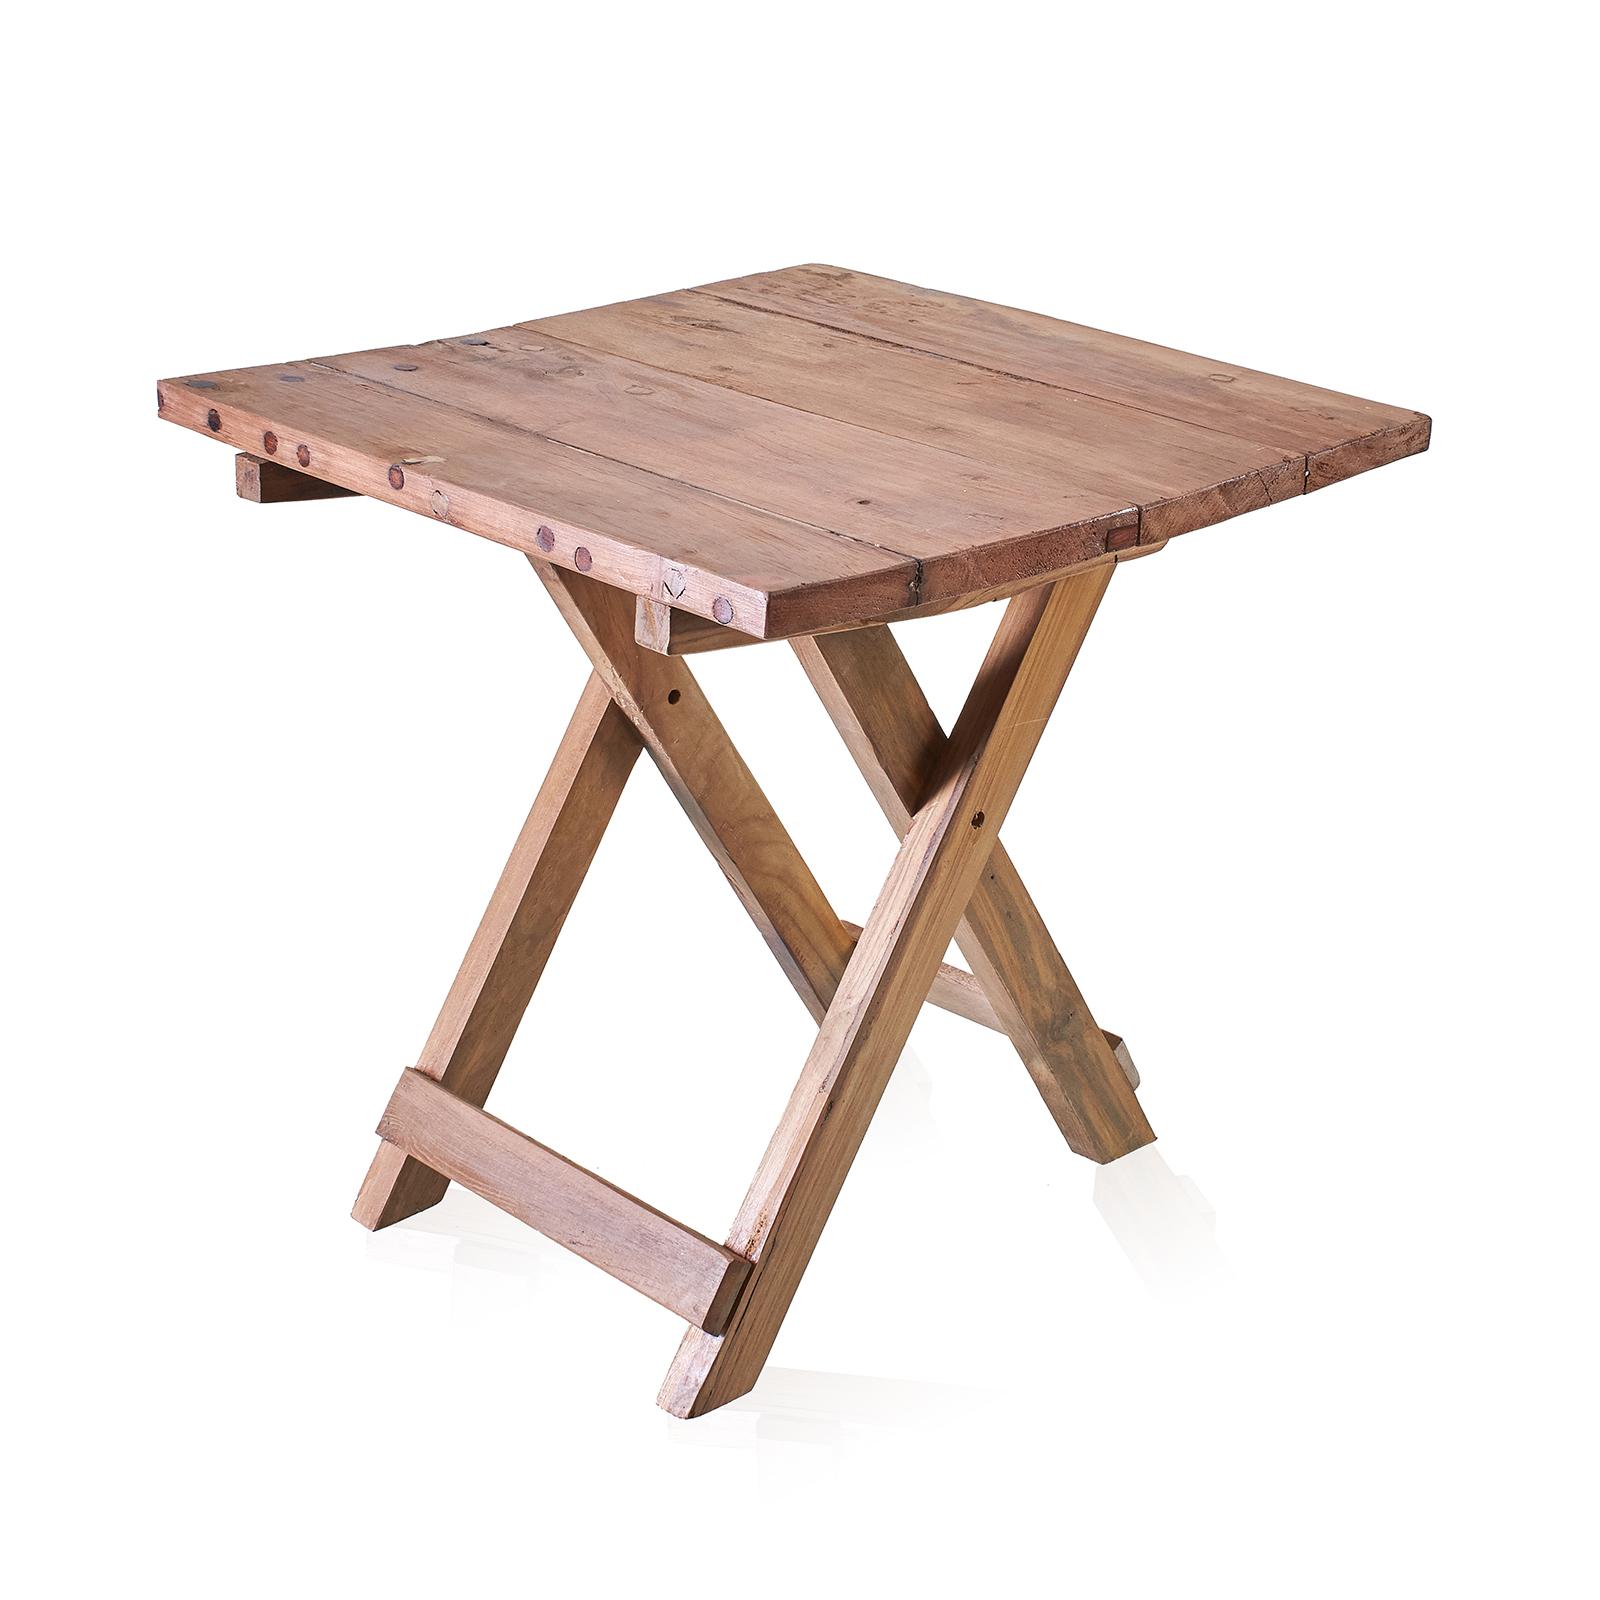 Čtvercový skládací stolek - 50x50cm